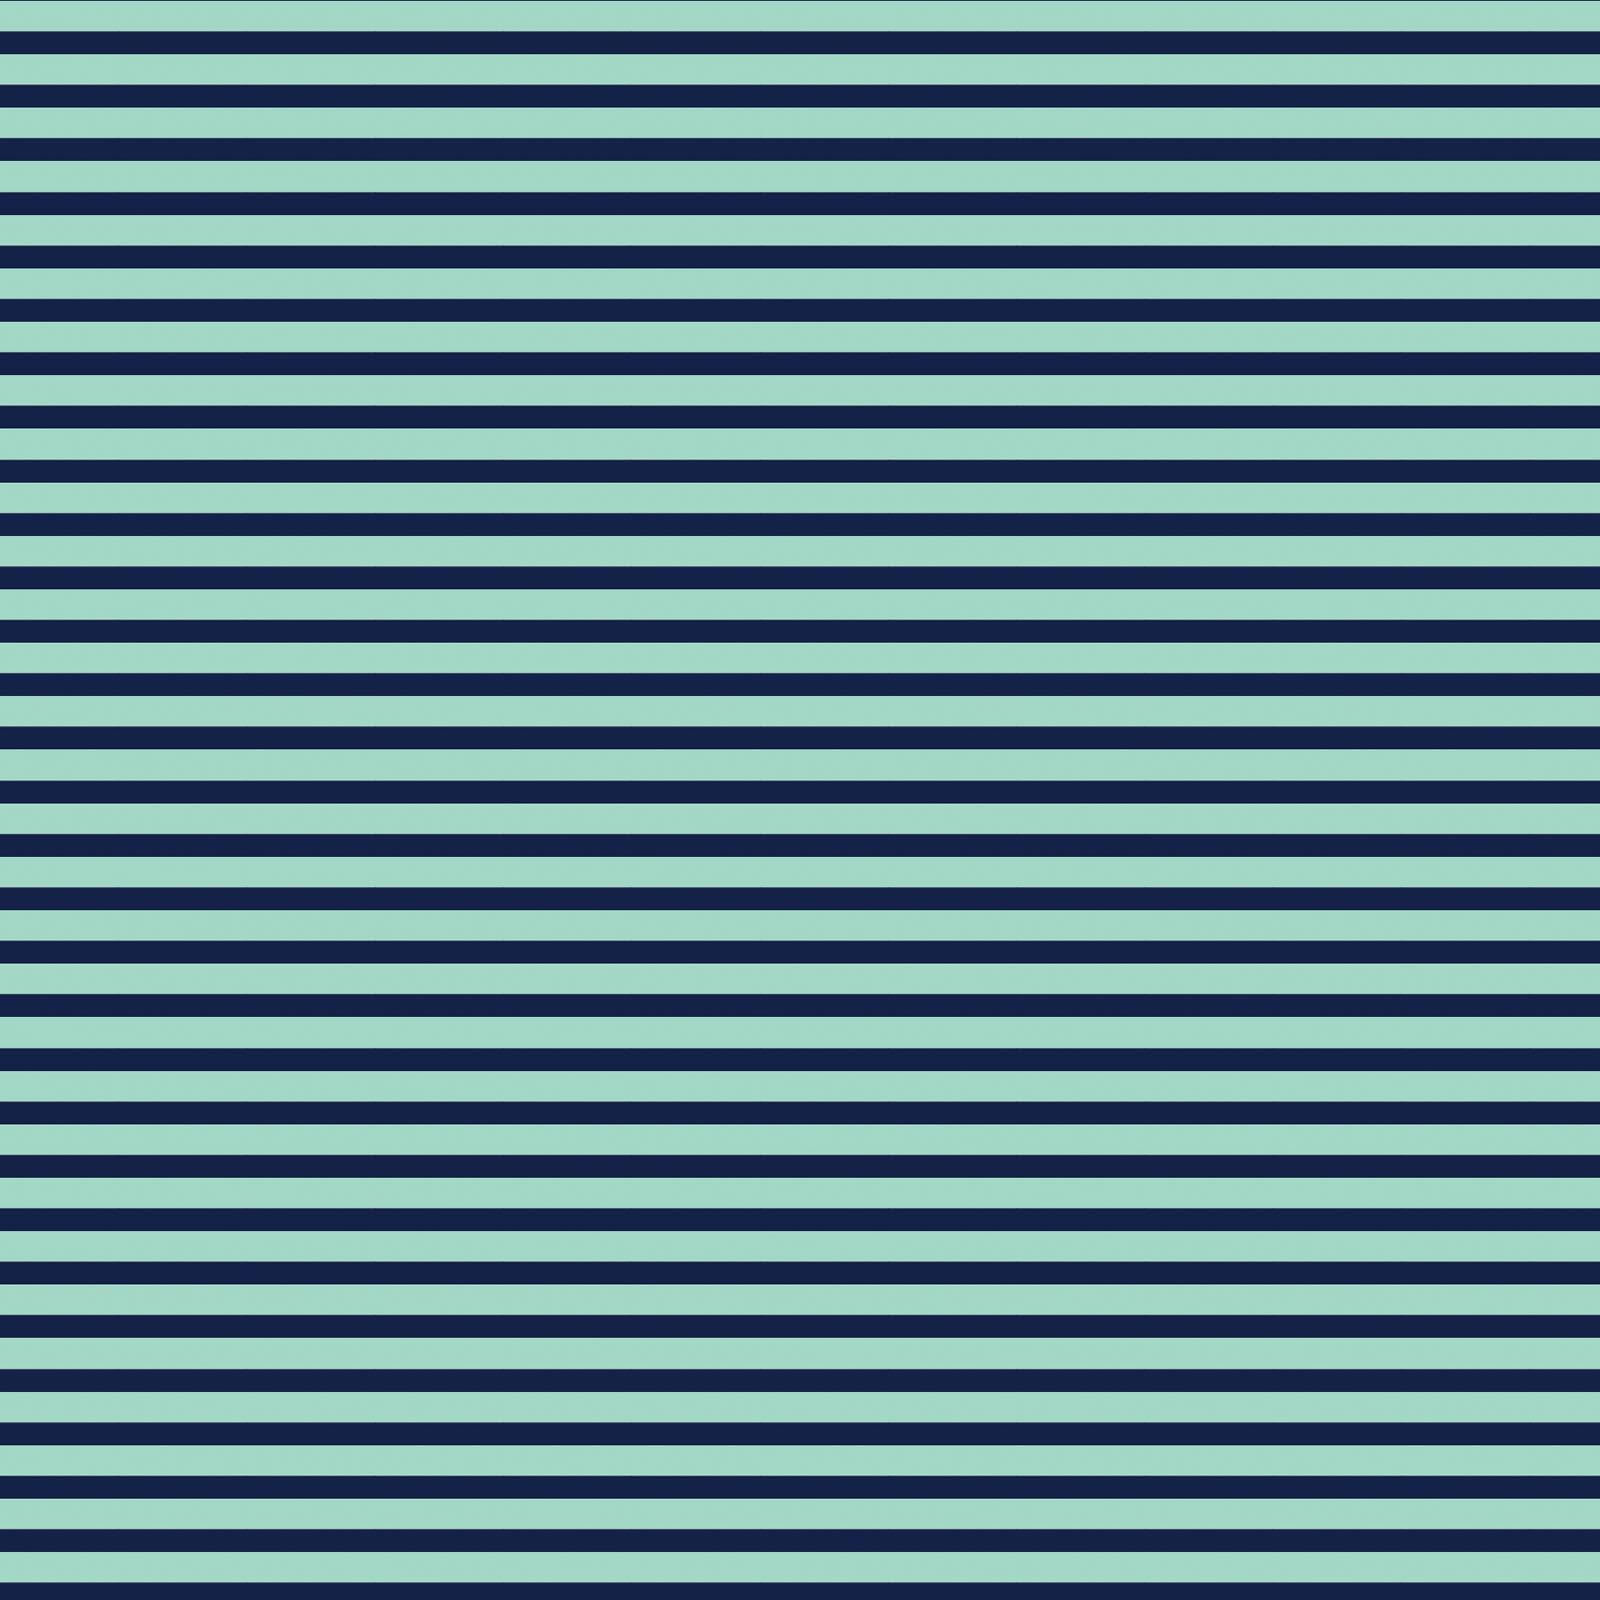 CLOUD 9: Navy Stripe STH# 11228146